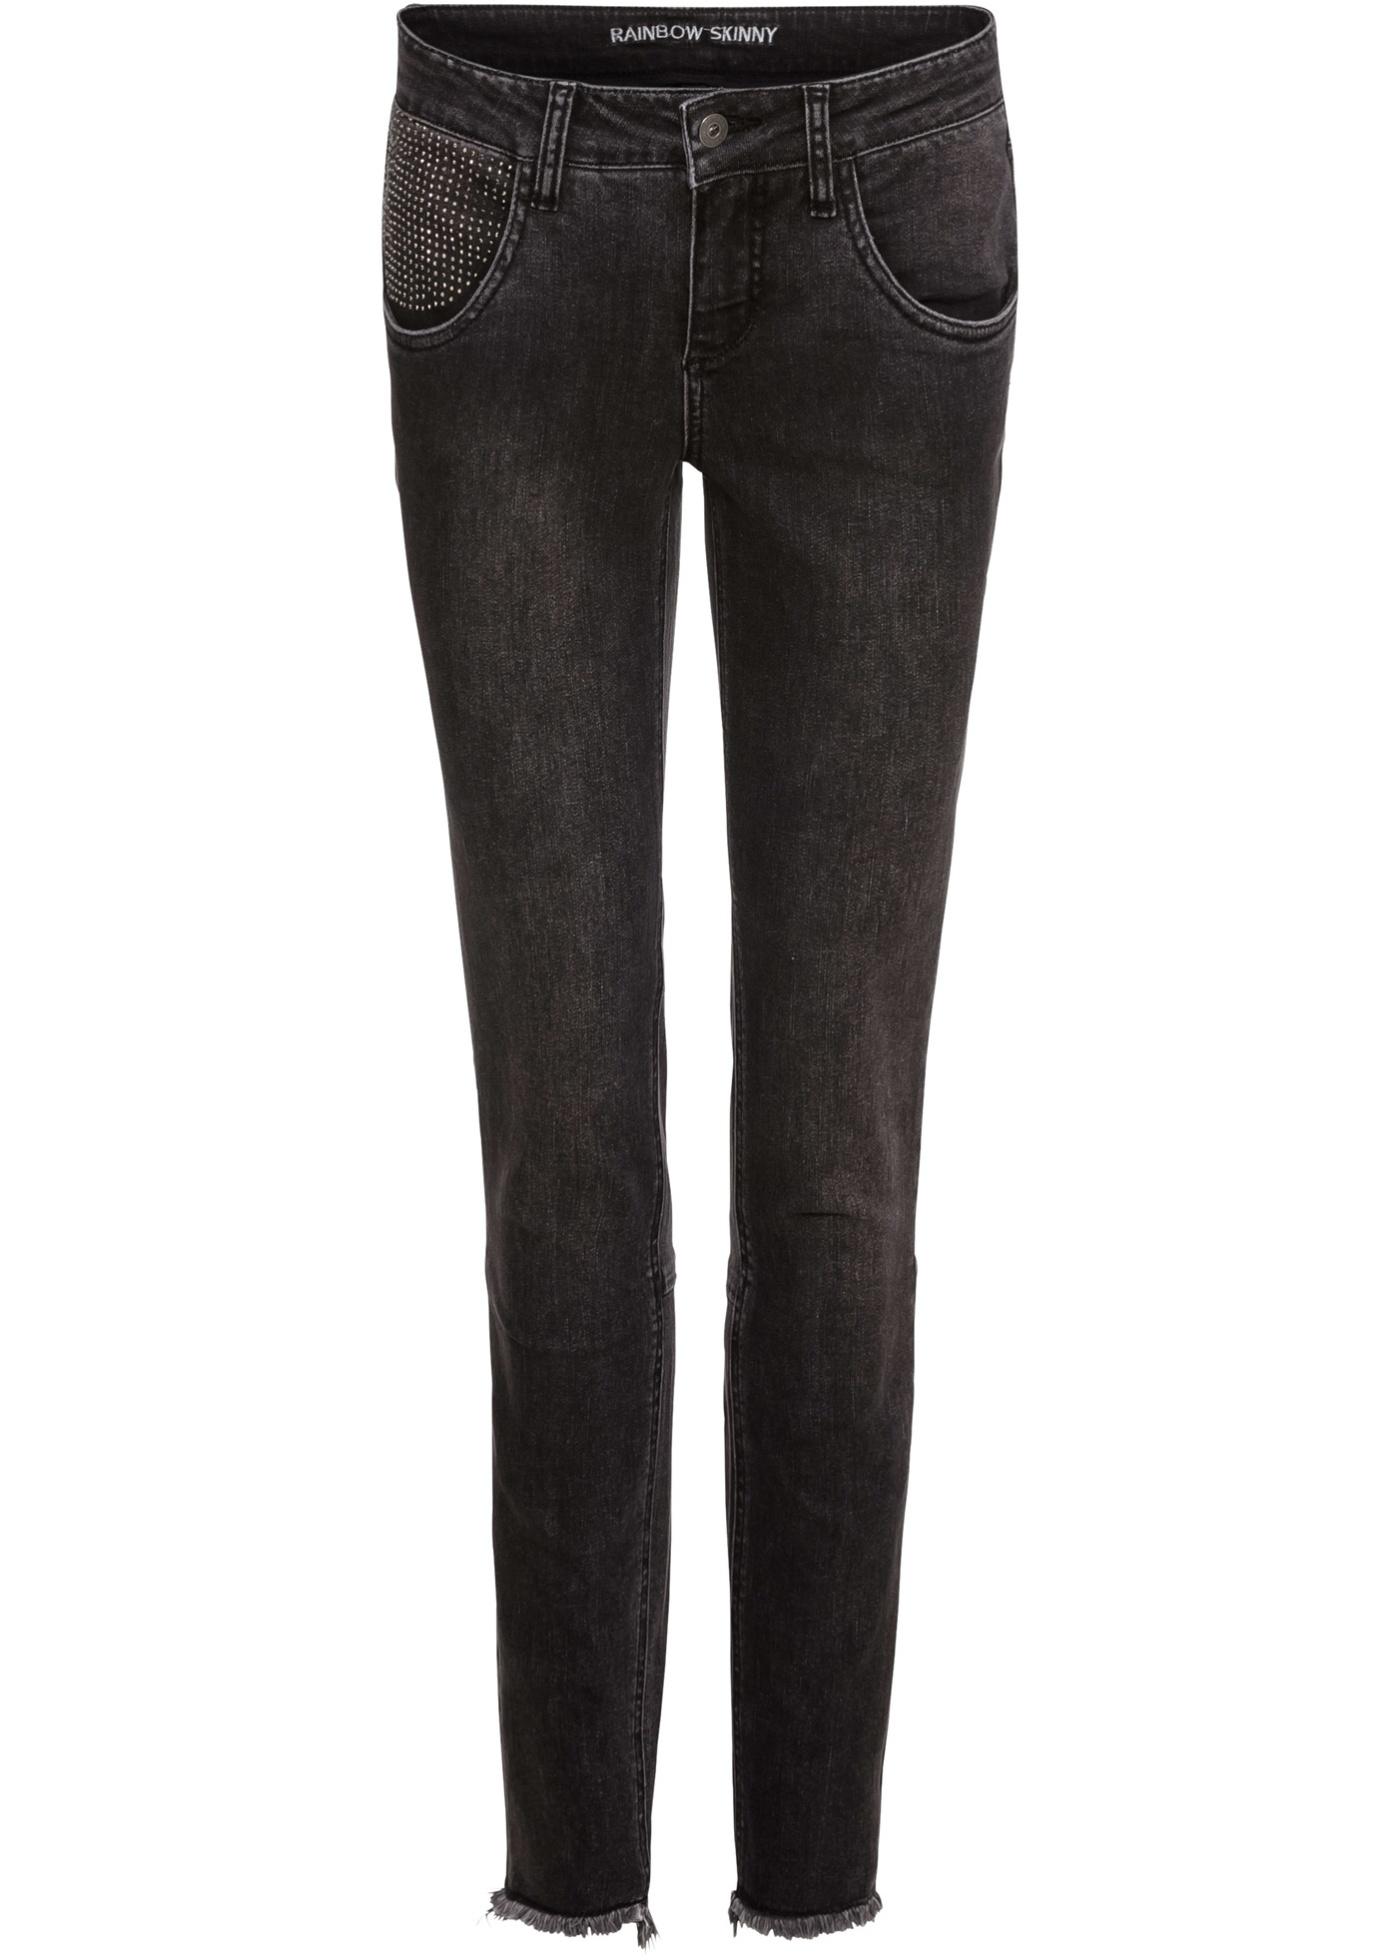 Bonprix SE - Skinny jeans med dragkedja 159.00